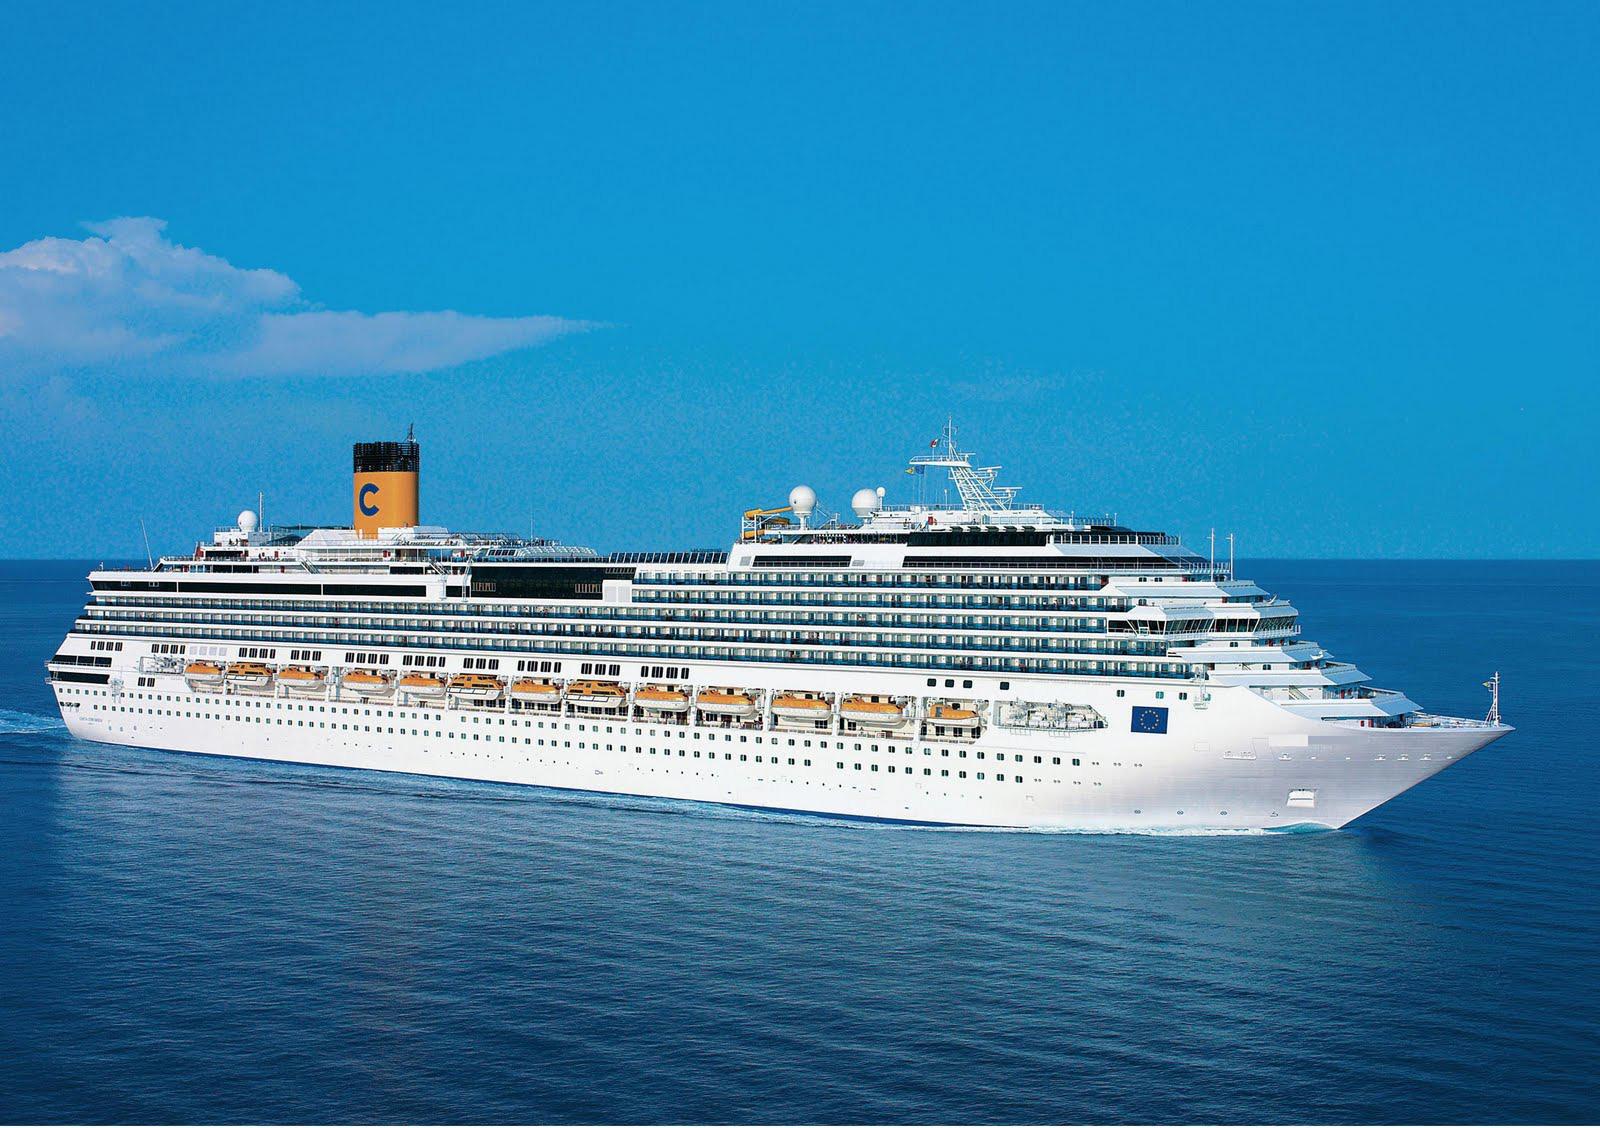 Croaziera 2017 - Mediterana de Vest (Savona) - Costa Cruises - Costa Favolosa - 4 nopti